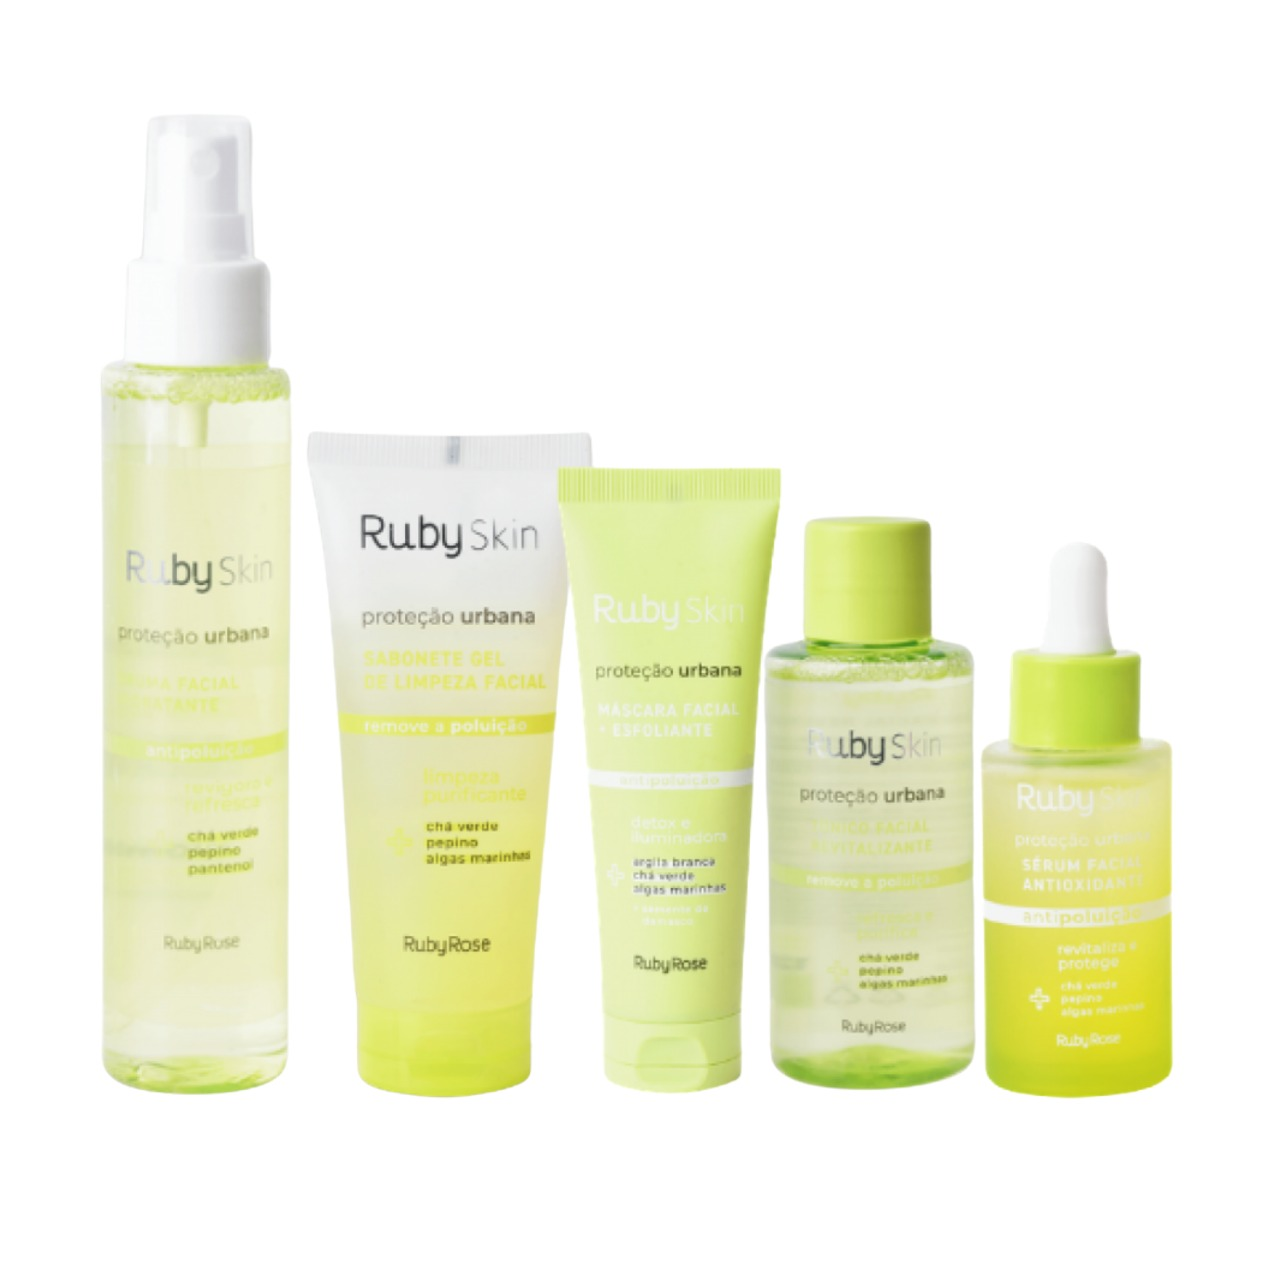 Kit Ruby Skin Proteção Urbana  Ruby Rose - 5 Produtos